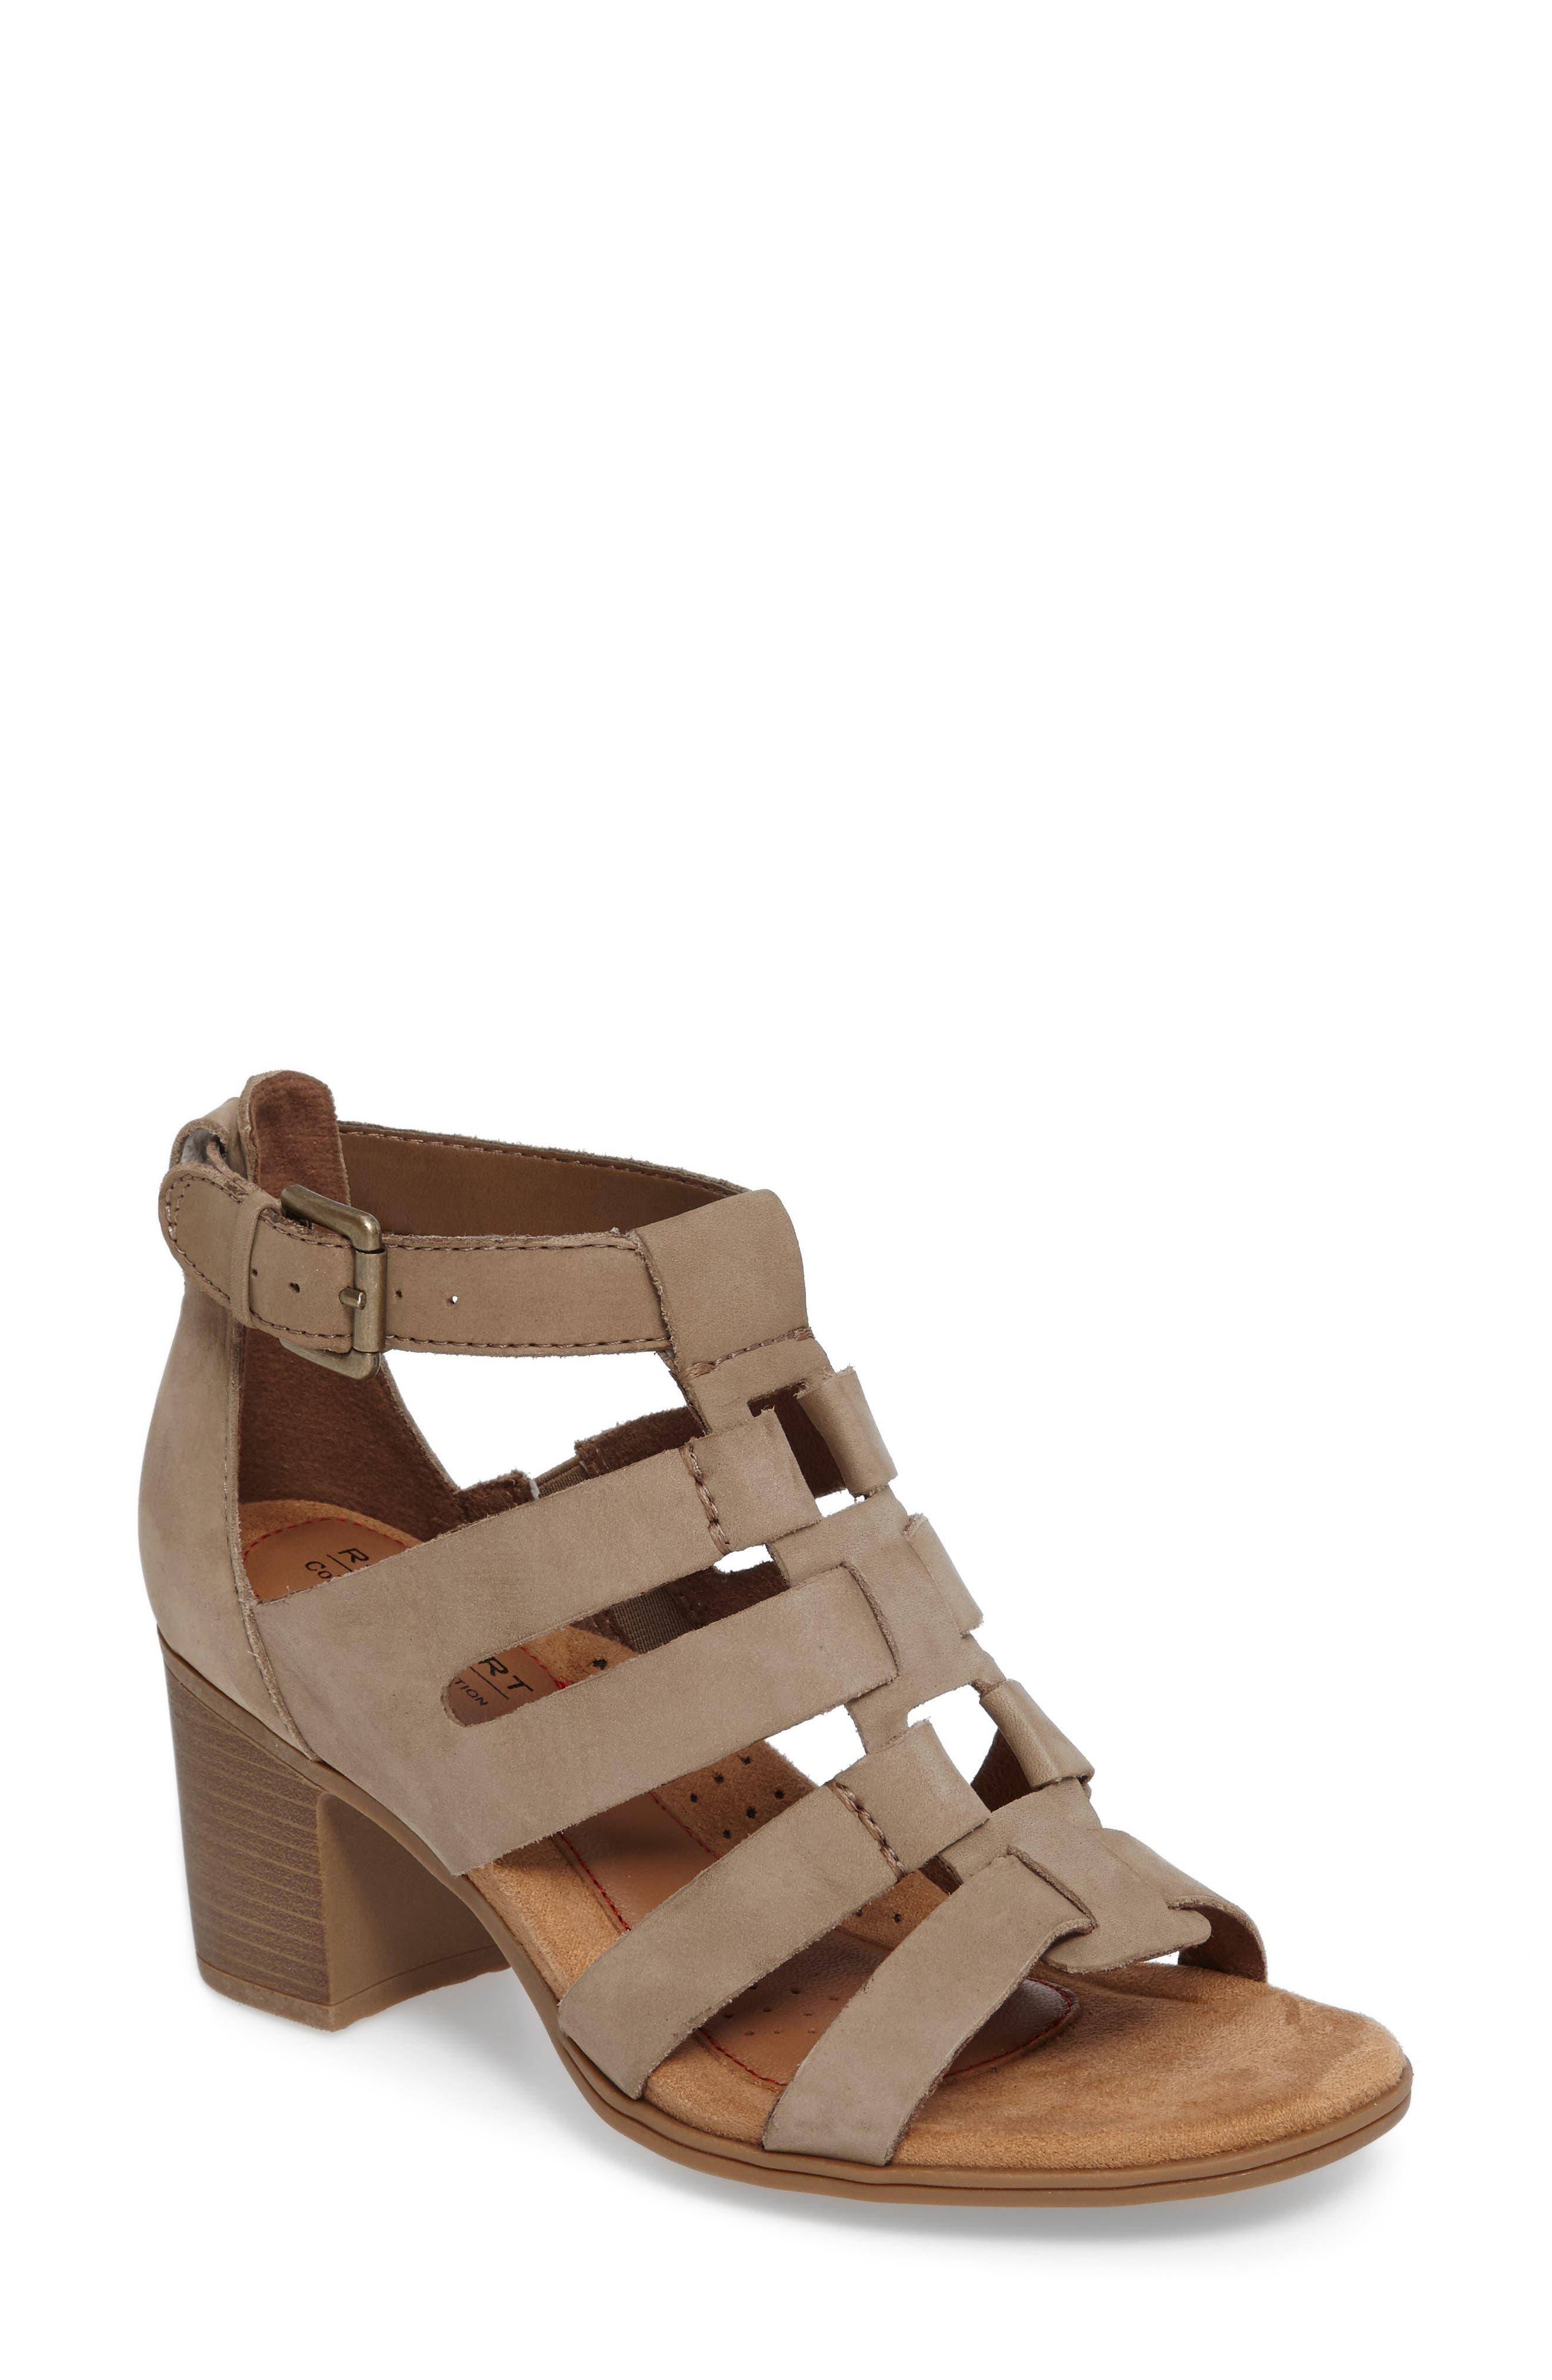 Alternate Image 1 Selected - Rockport Cobb Hill Hattie Block Heel Gladiator Sandal (Women)